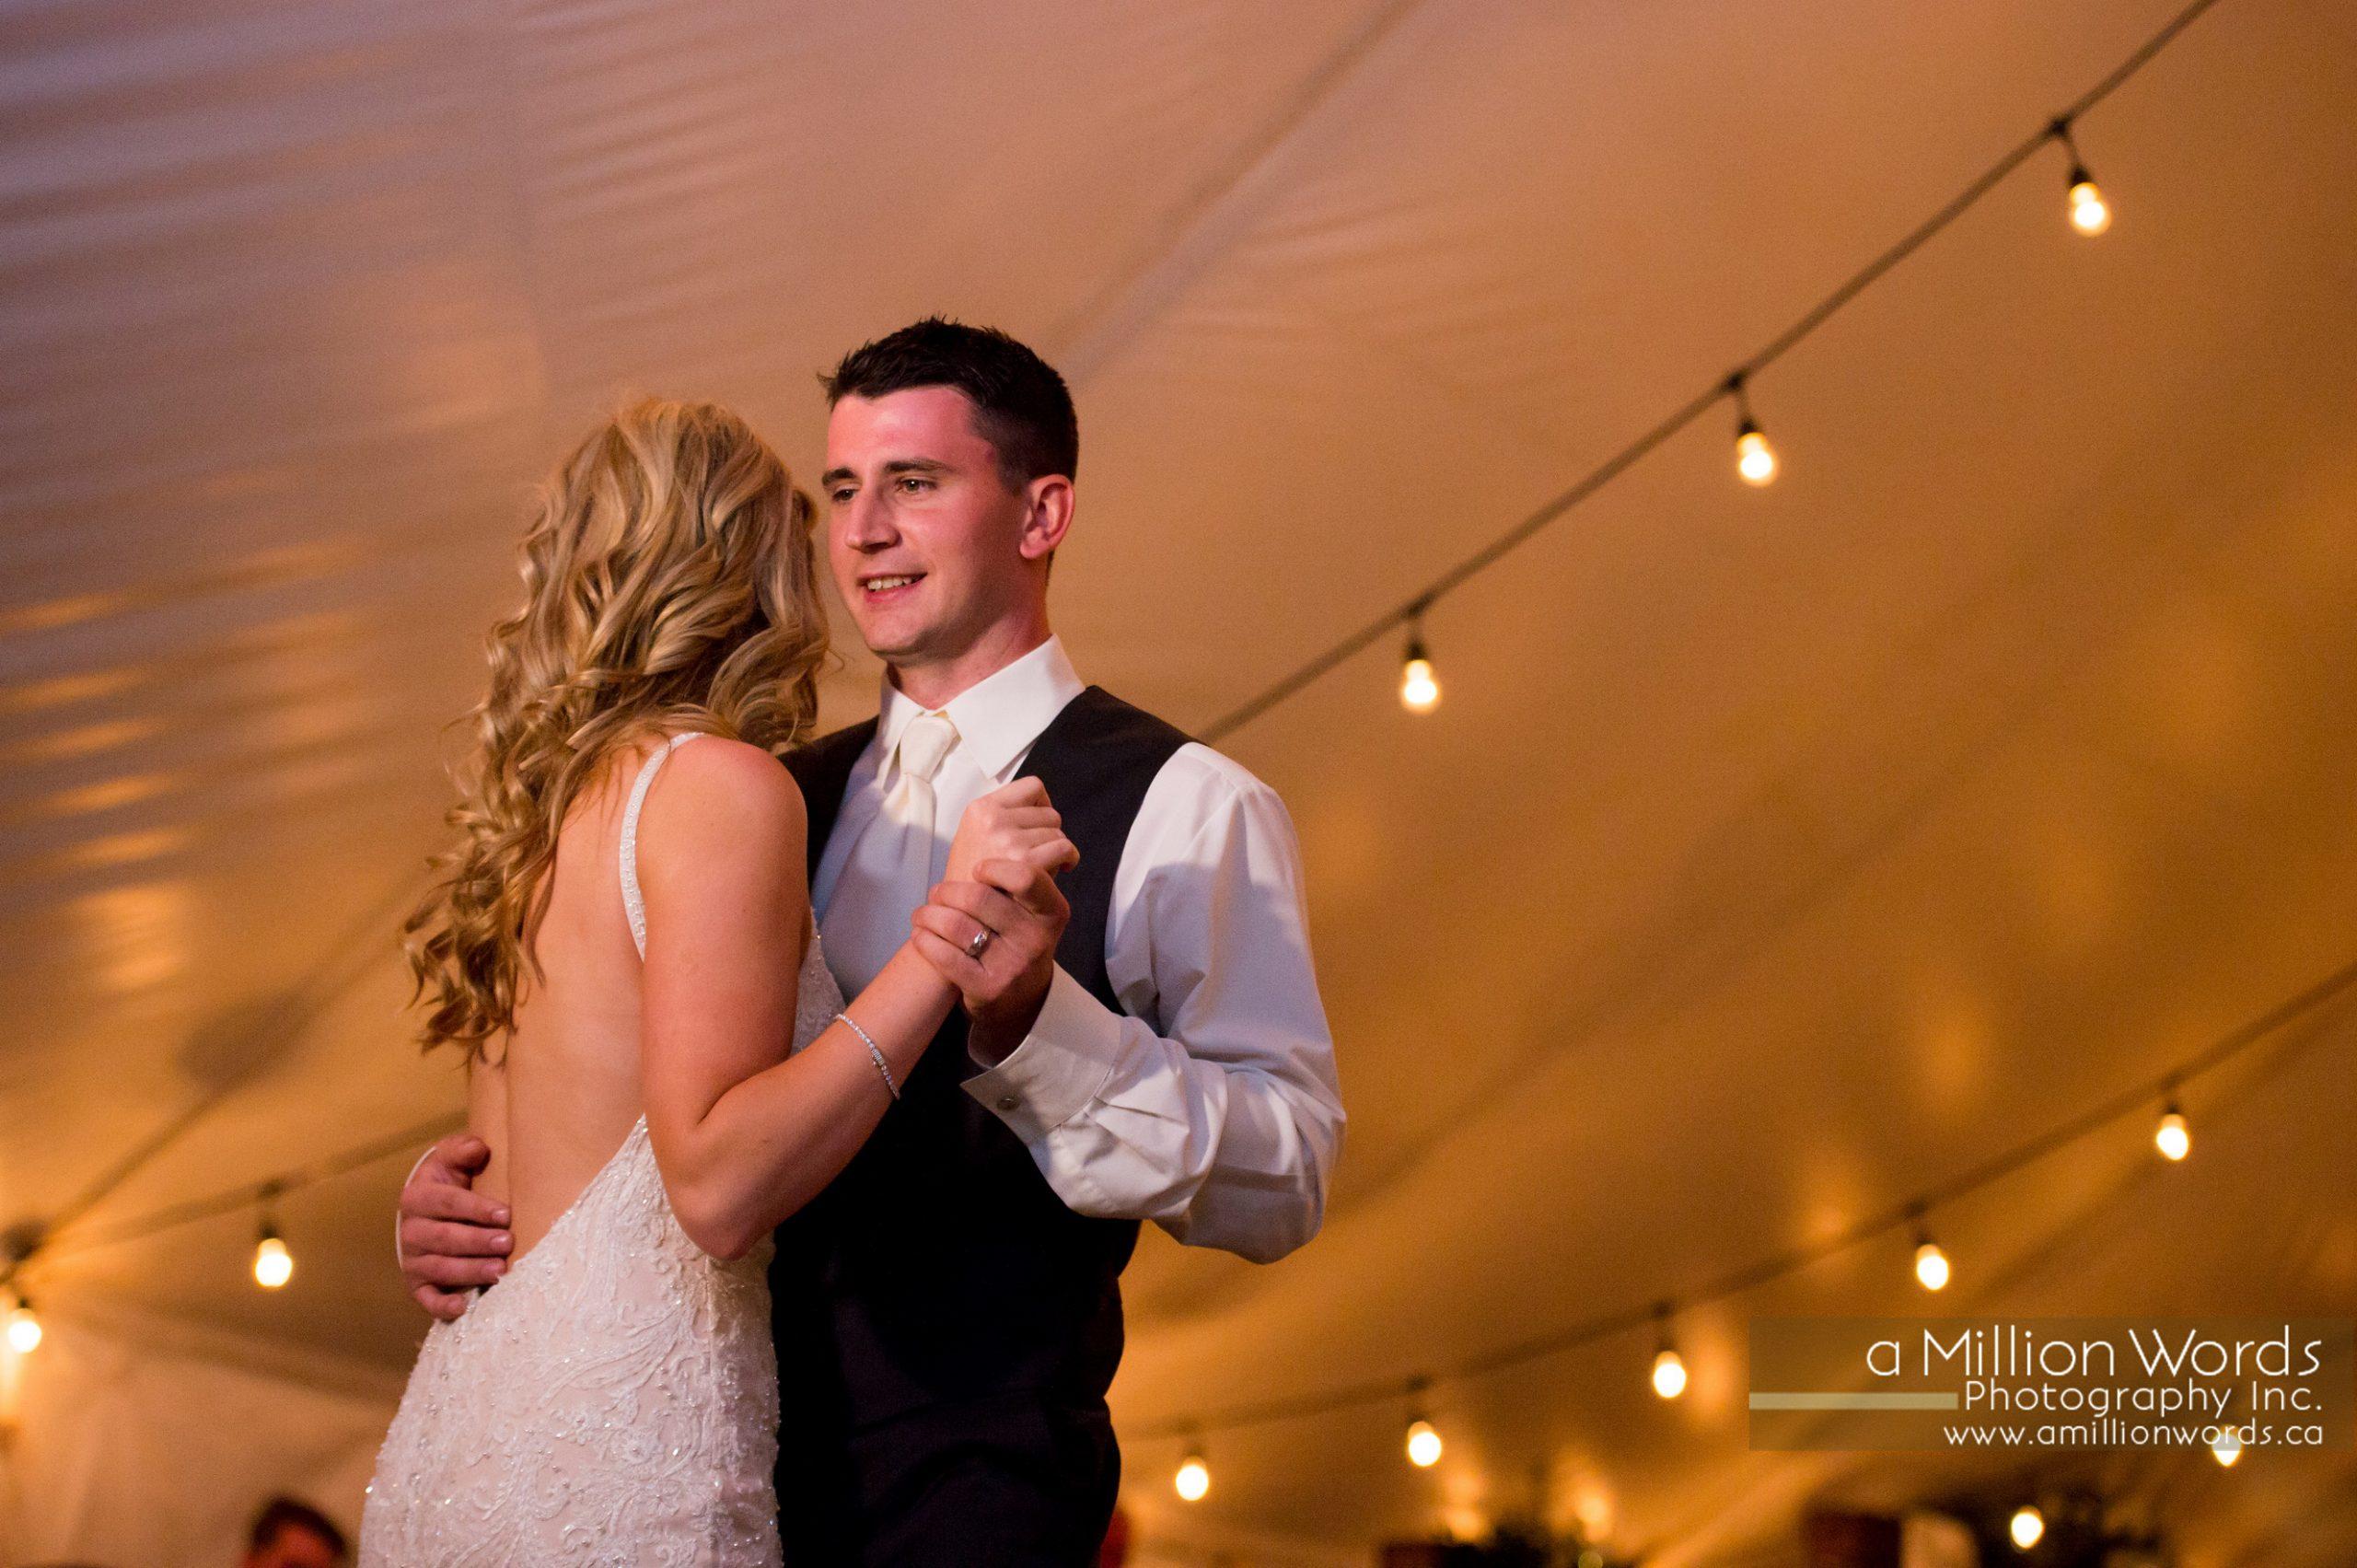 arthur_wedding_photographer74